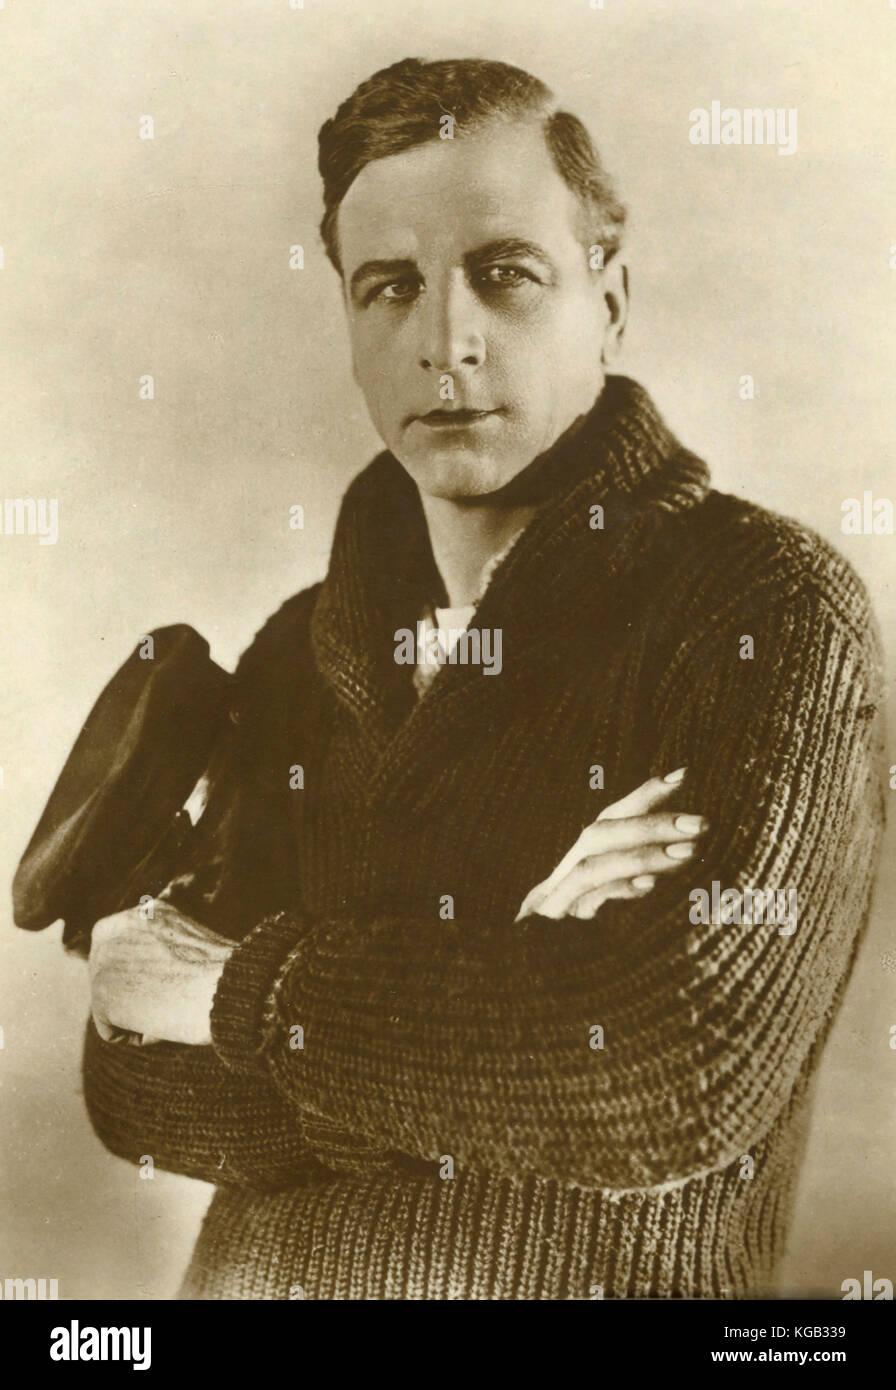 American actor Milton Sills - Stock Image